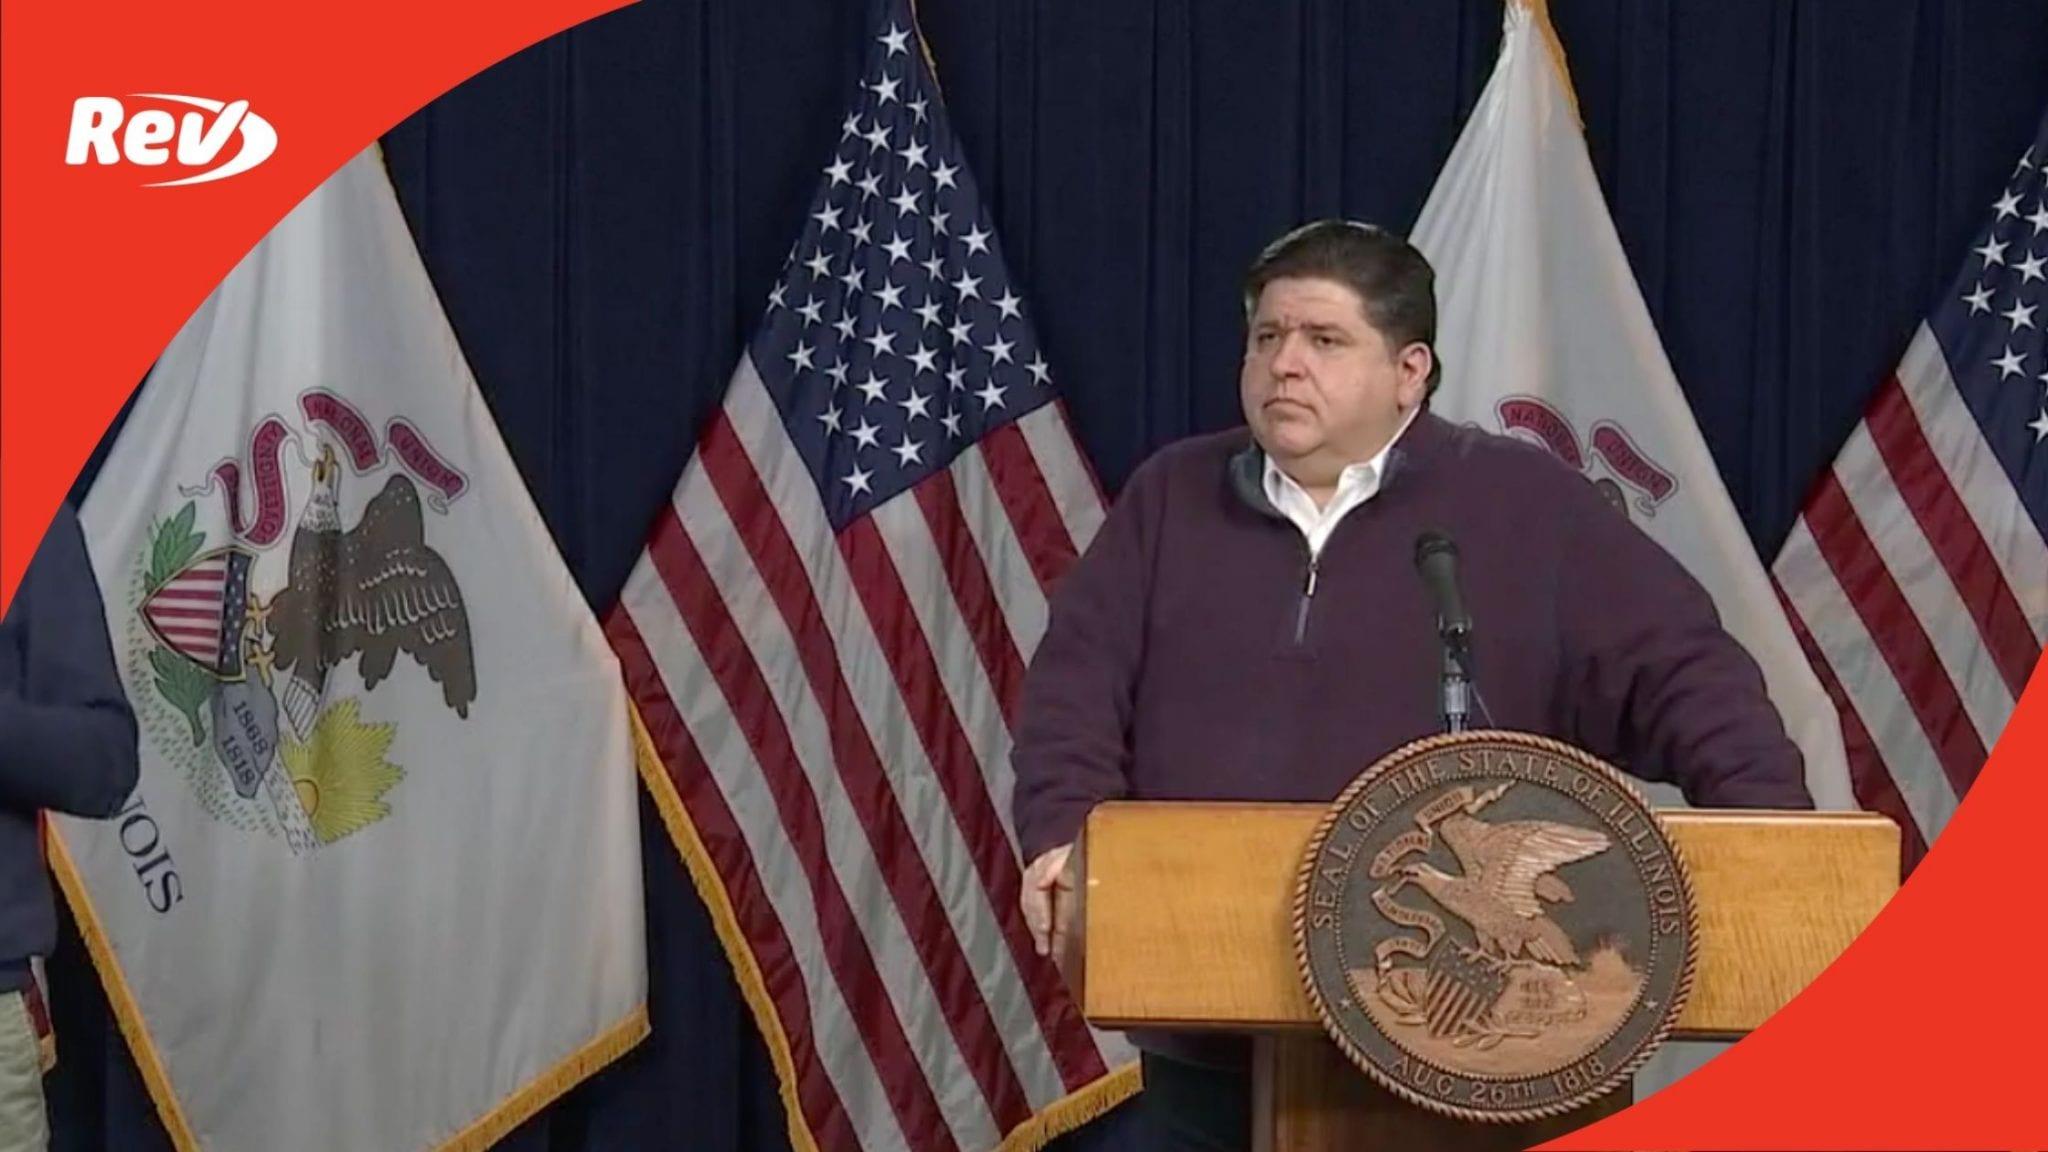 Illinois Gov. JB Pritzker COVID-19 Press Conference Transcript December 15